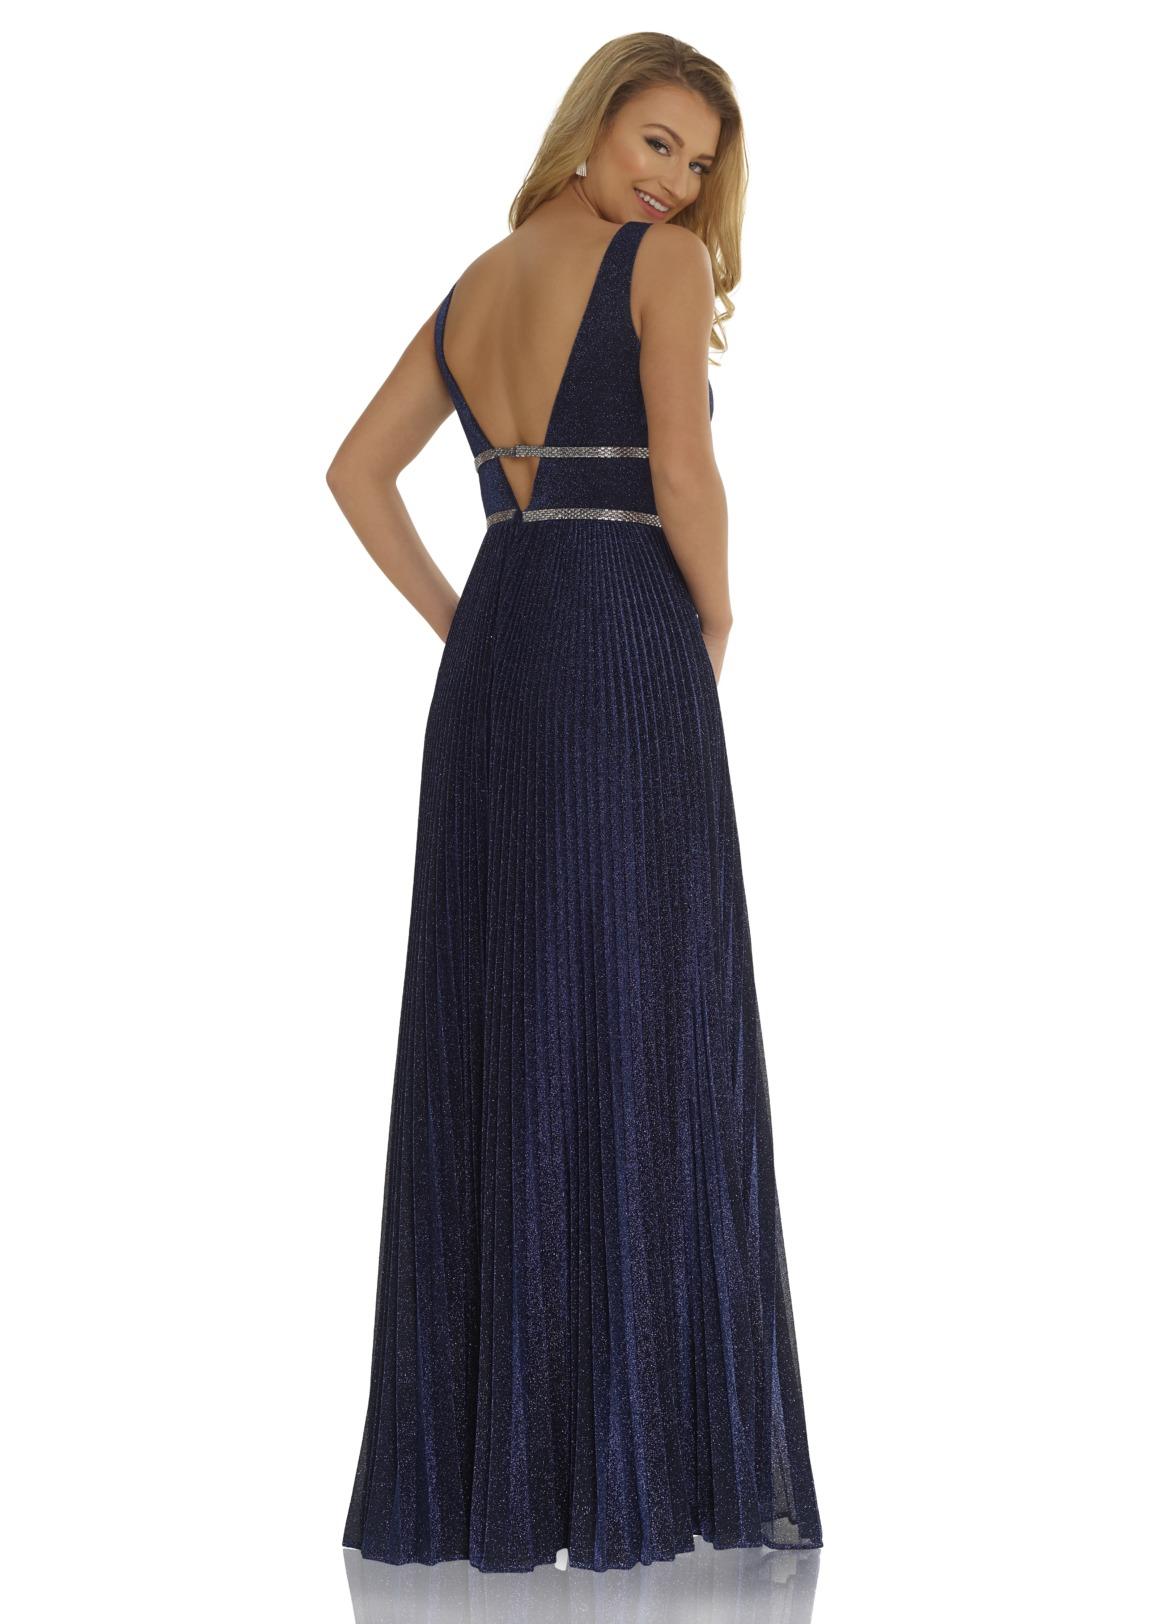 Abiball Kleid lang - navy blau dunkelblau plissee glitzer - Rücken